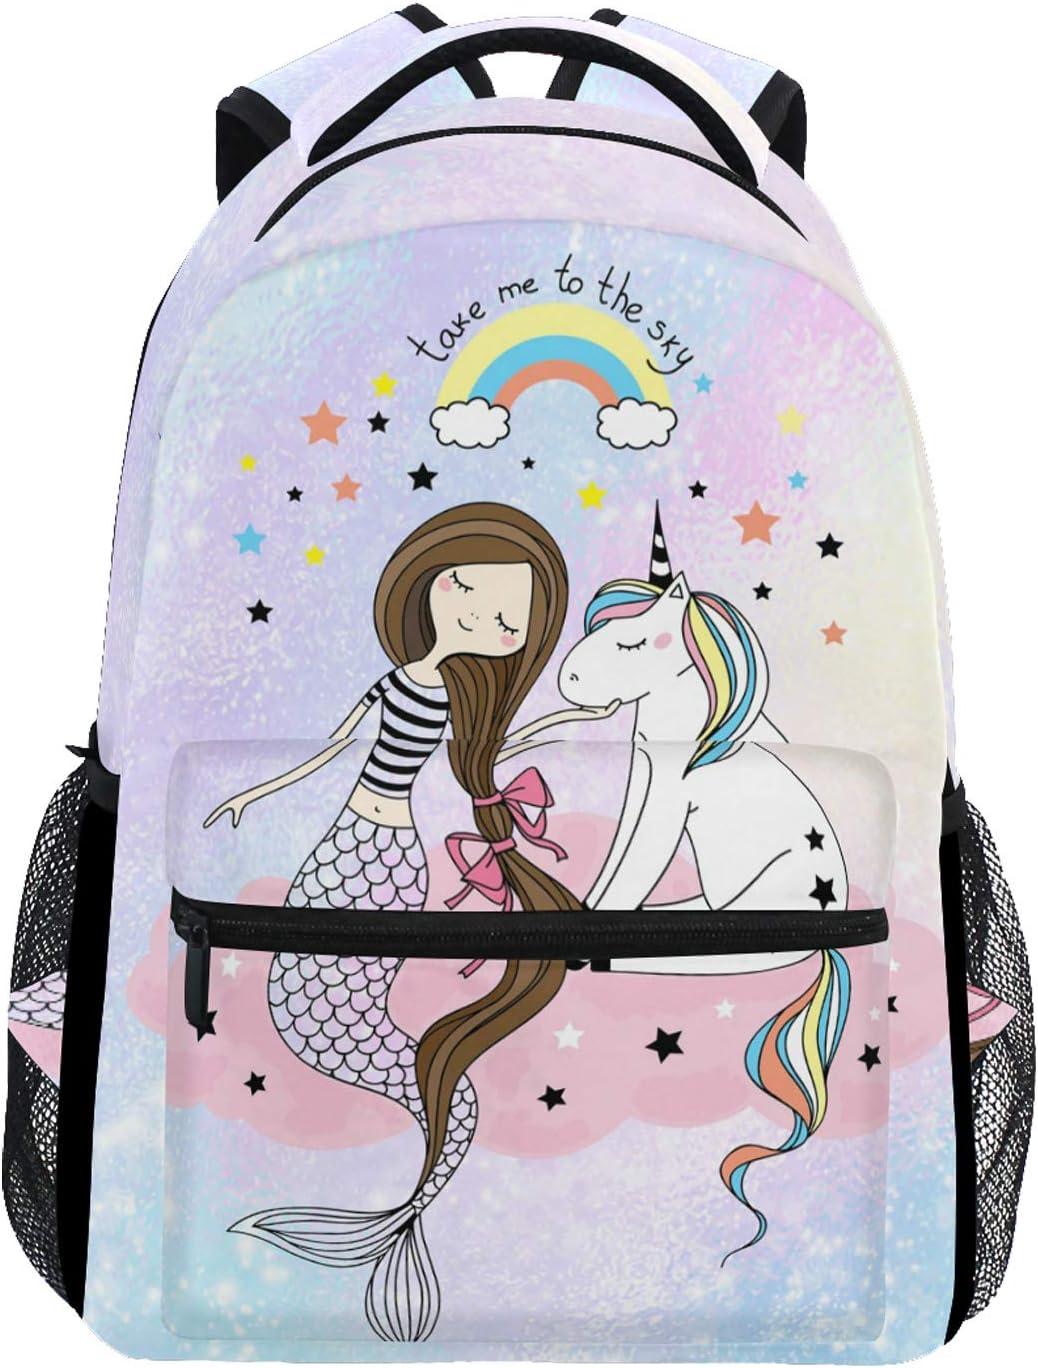 Wamika Mermaid Dab 67% OFF of fixed price Unicorn Kids Girls Finally resale start School B Backpack Bookbags